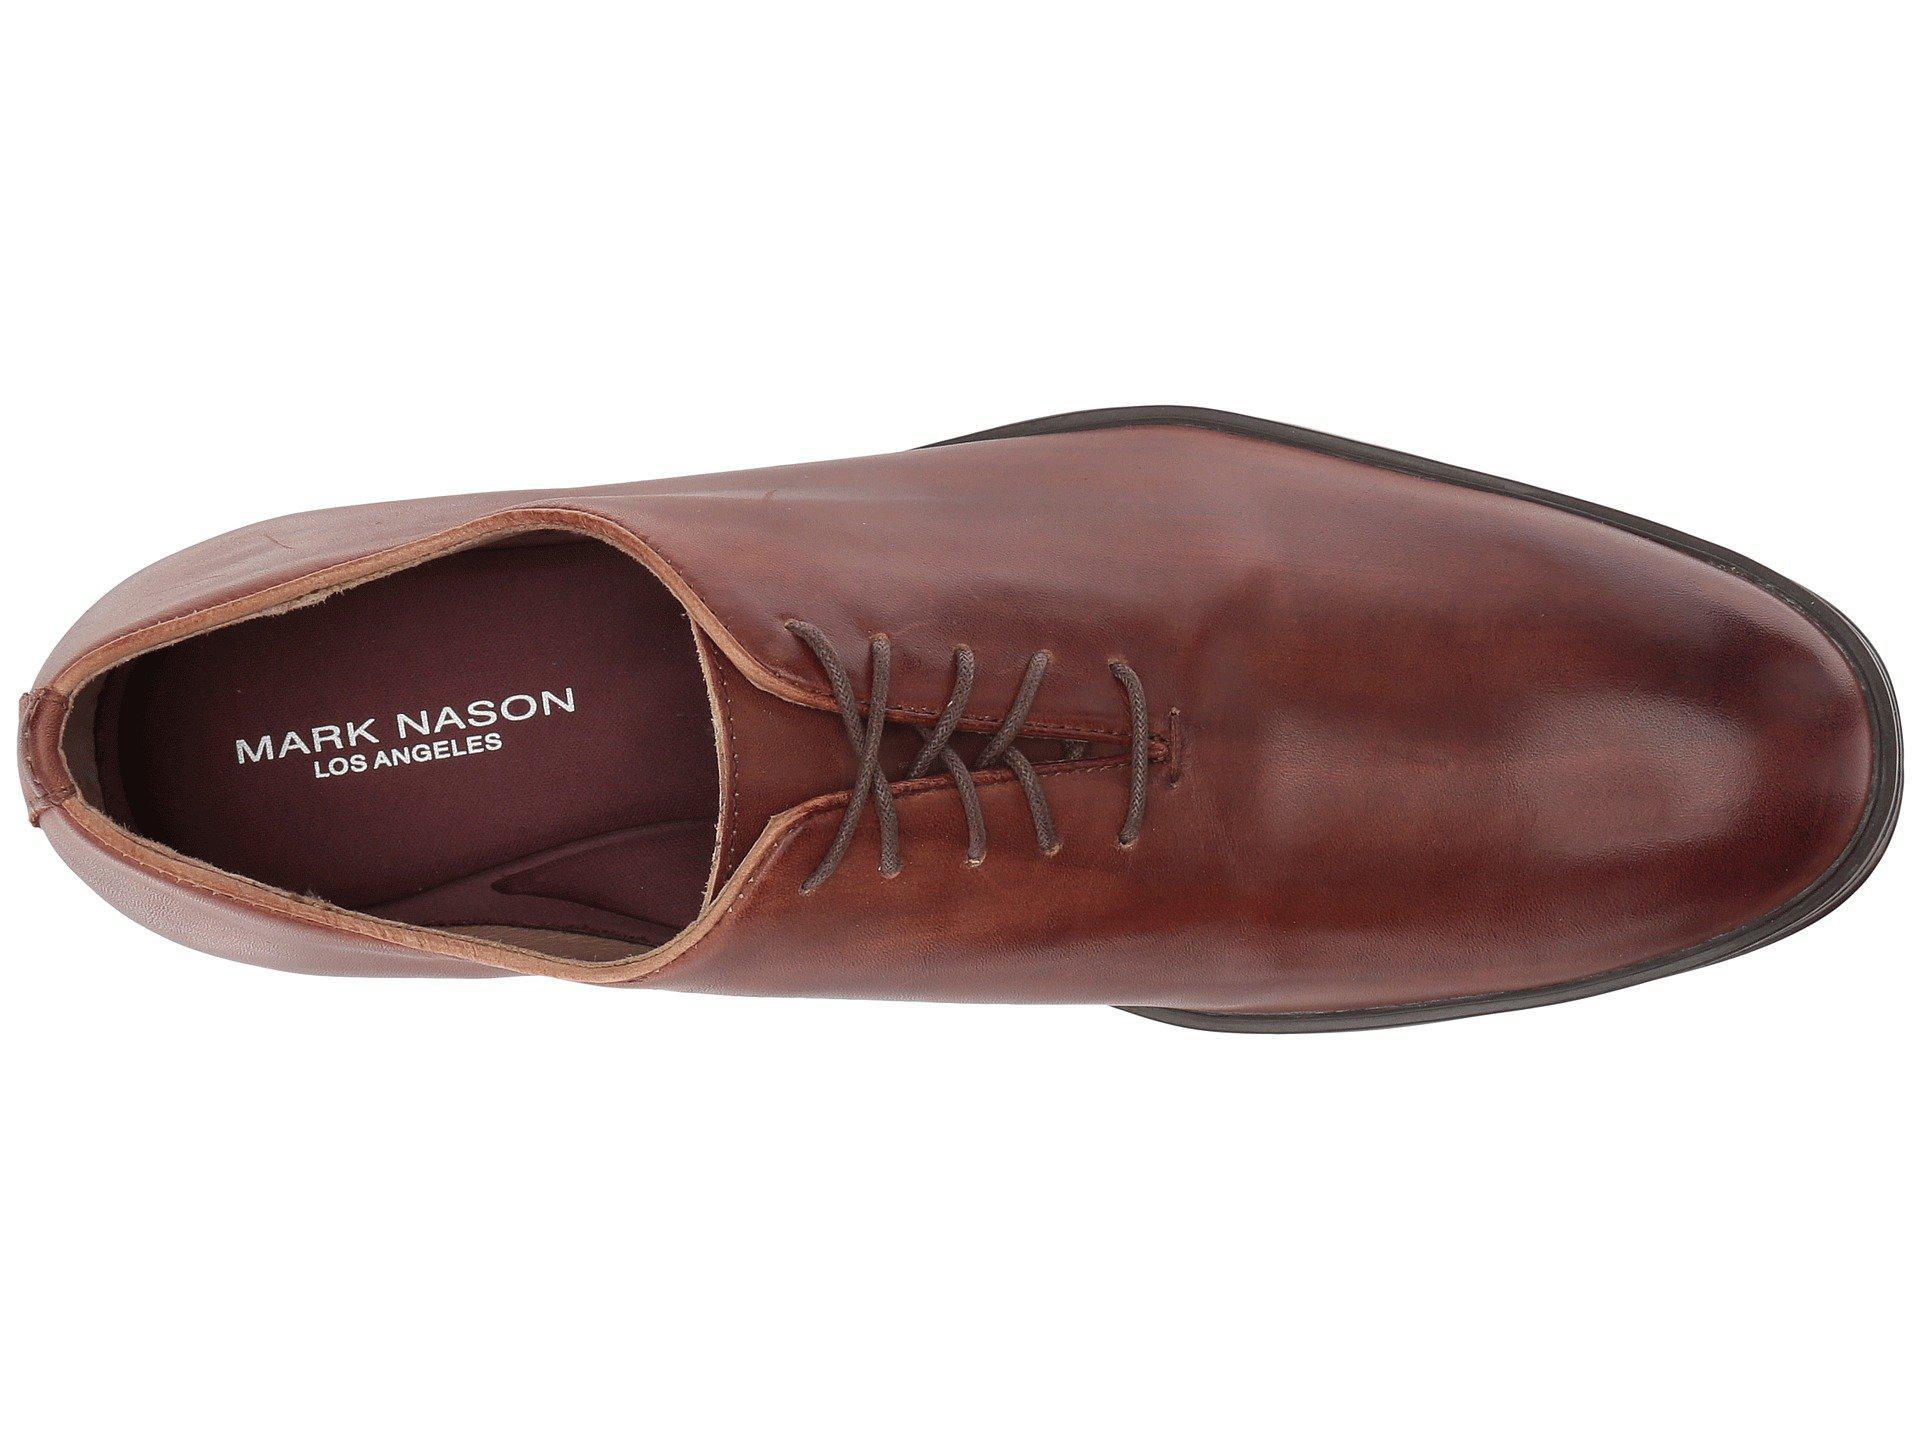 64c421168892 Lyst - Mark Nason Traditional Dress - Hopper (cognac) Men s Lace Up ...